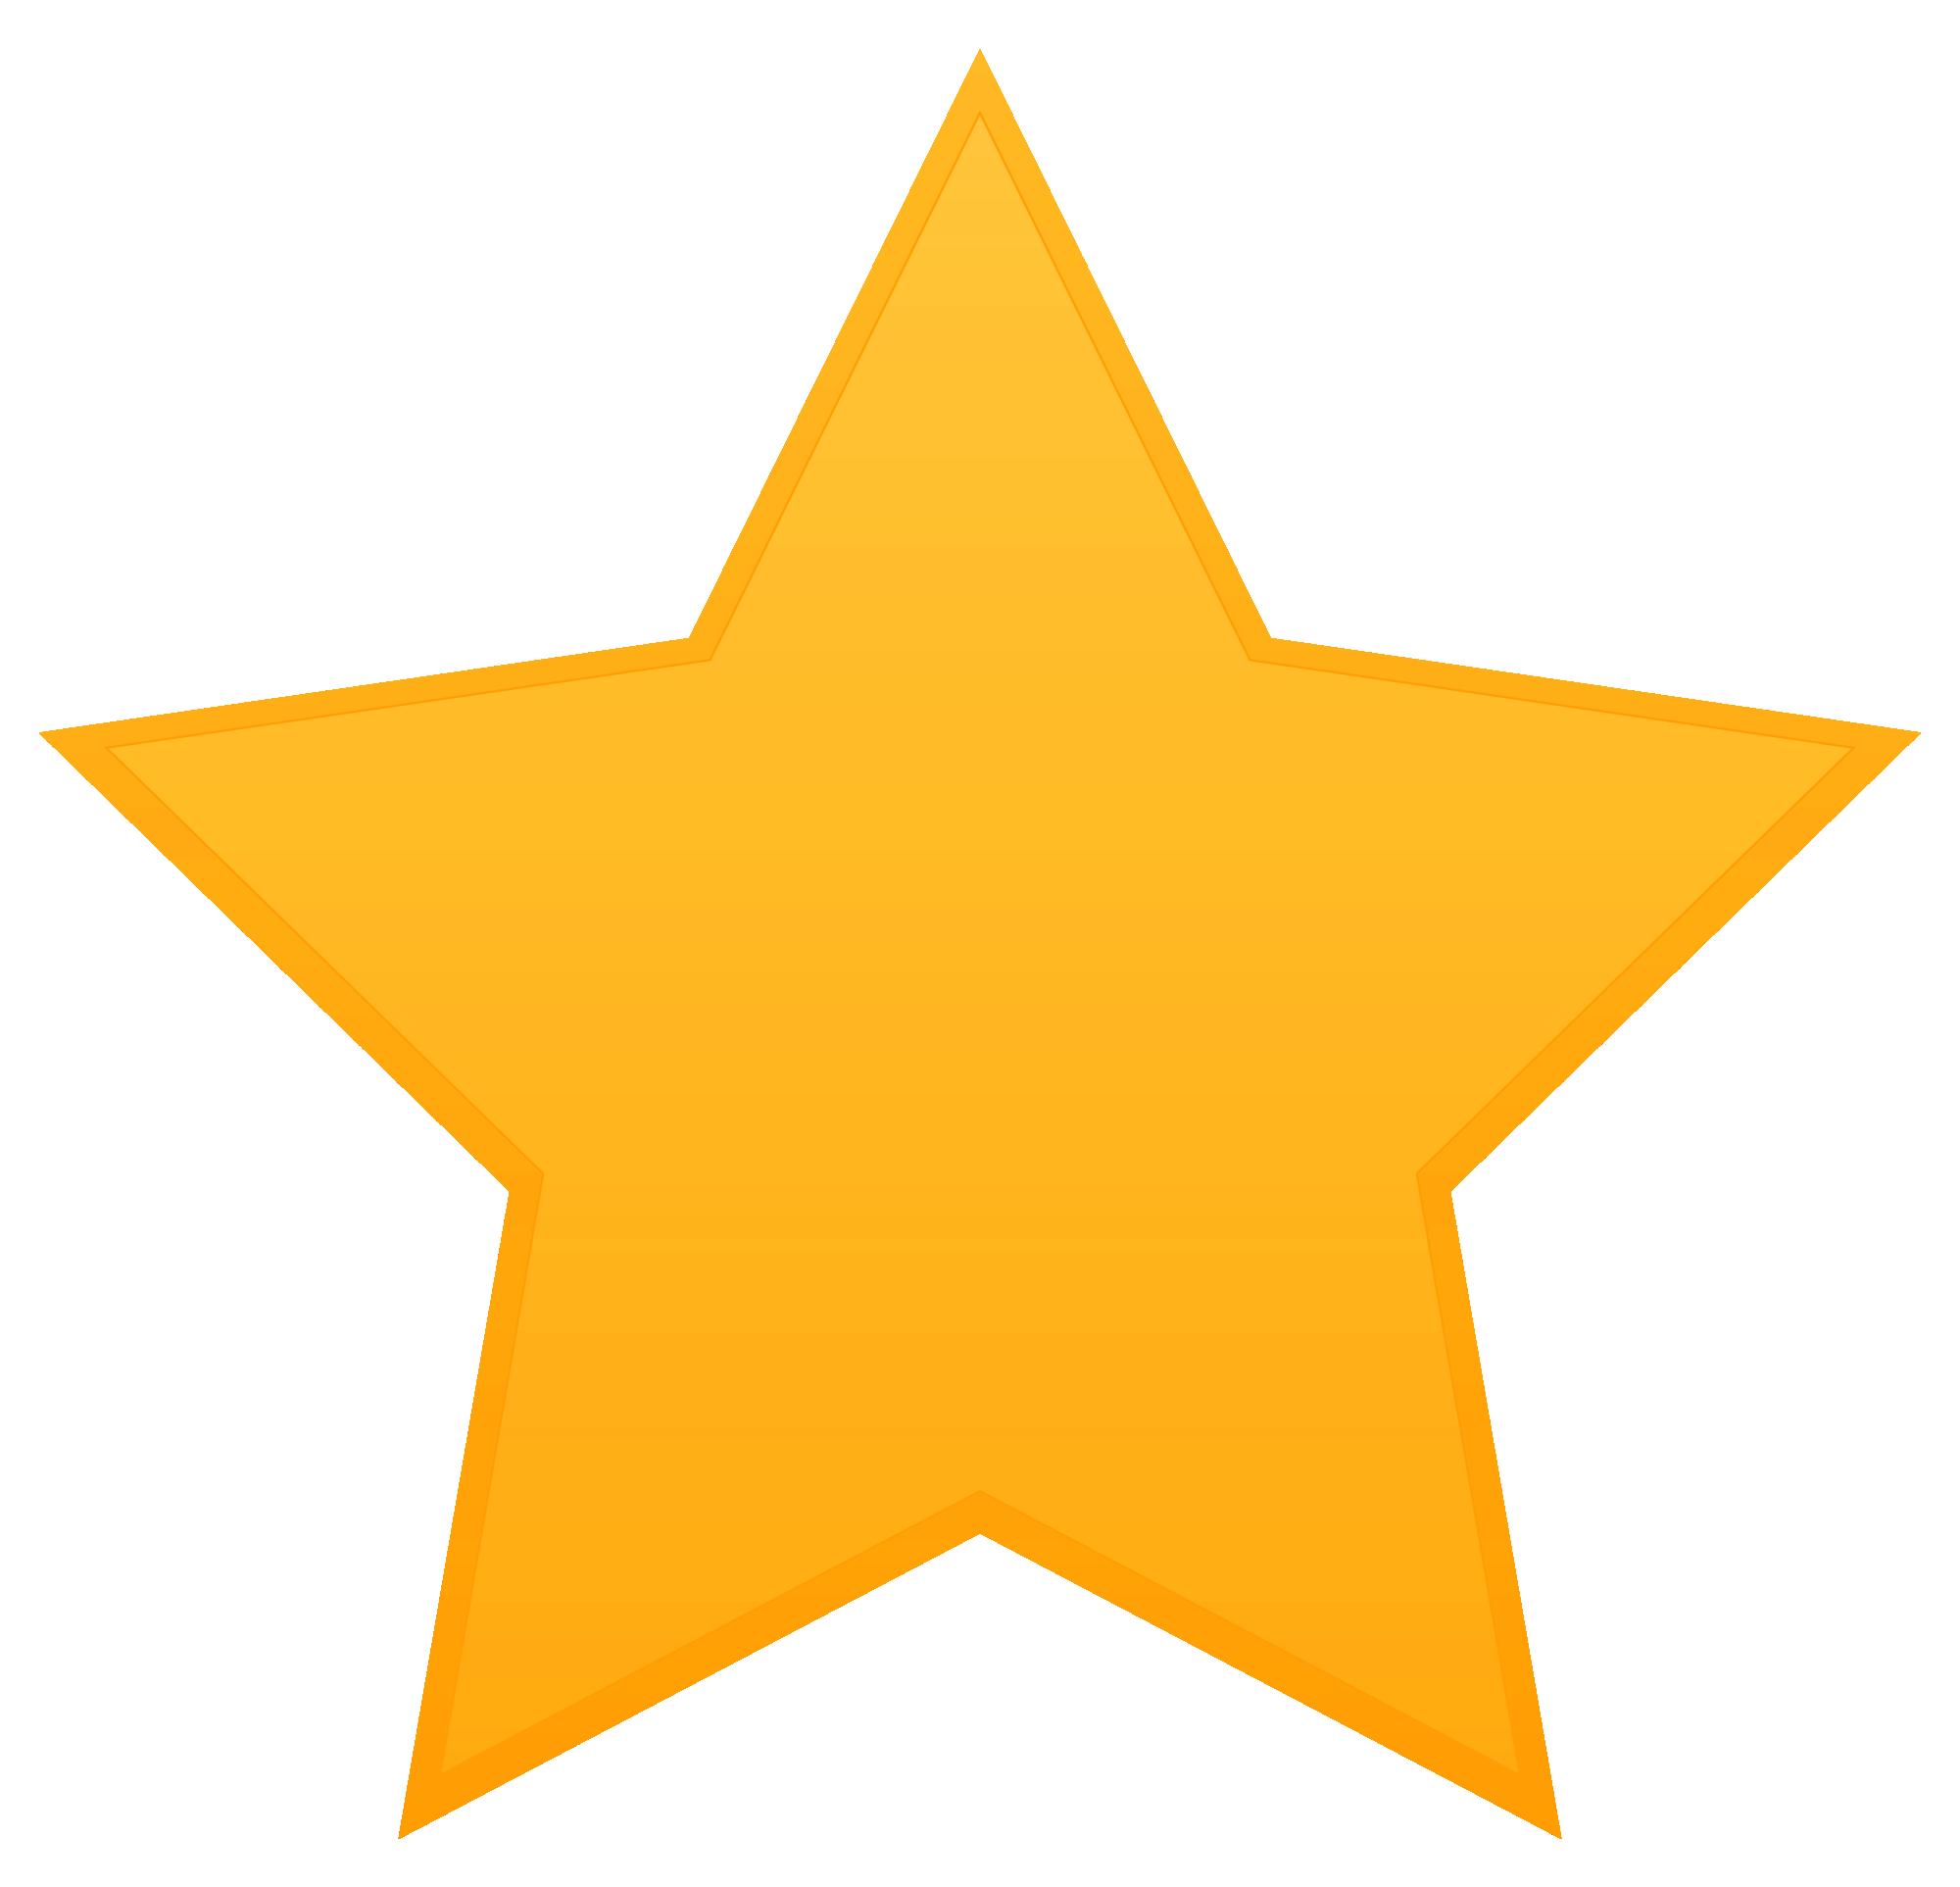 Star Vector PNG Transparent Image - Star PNG